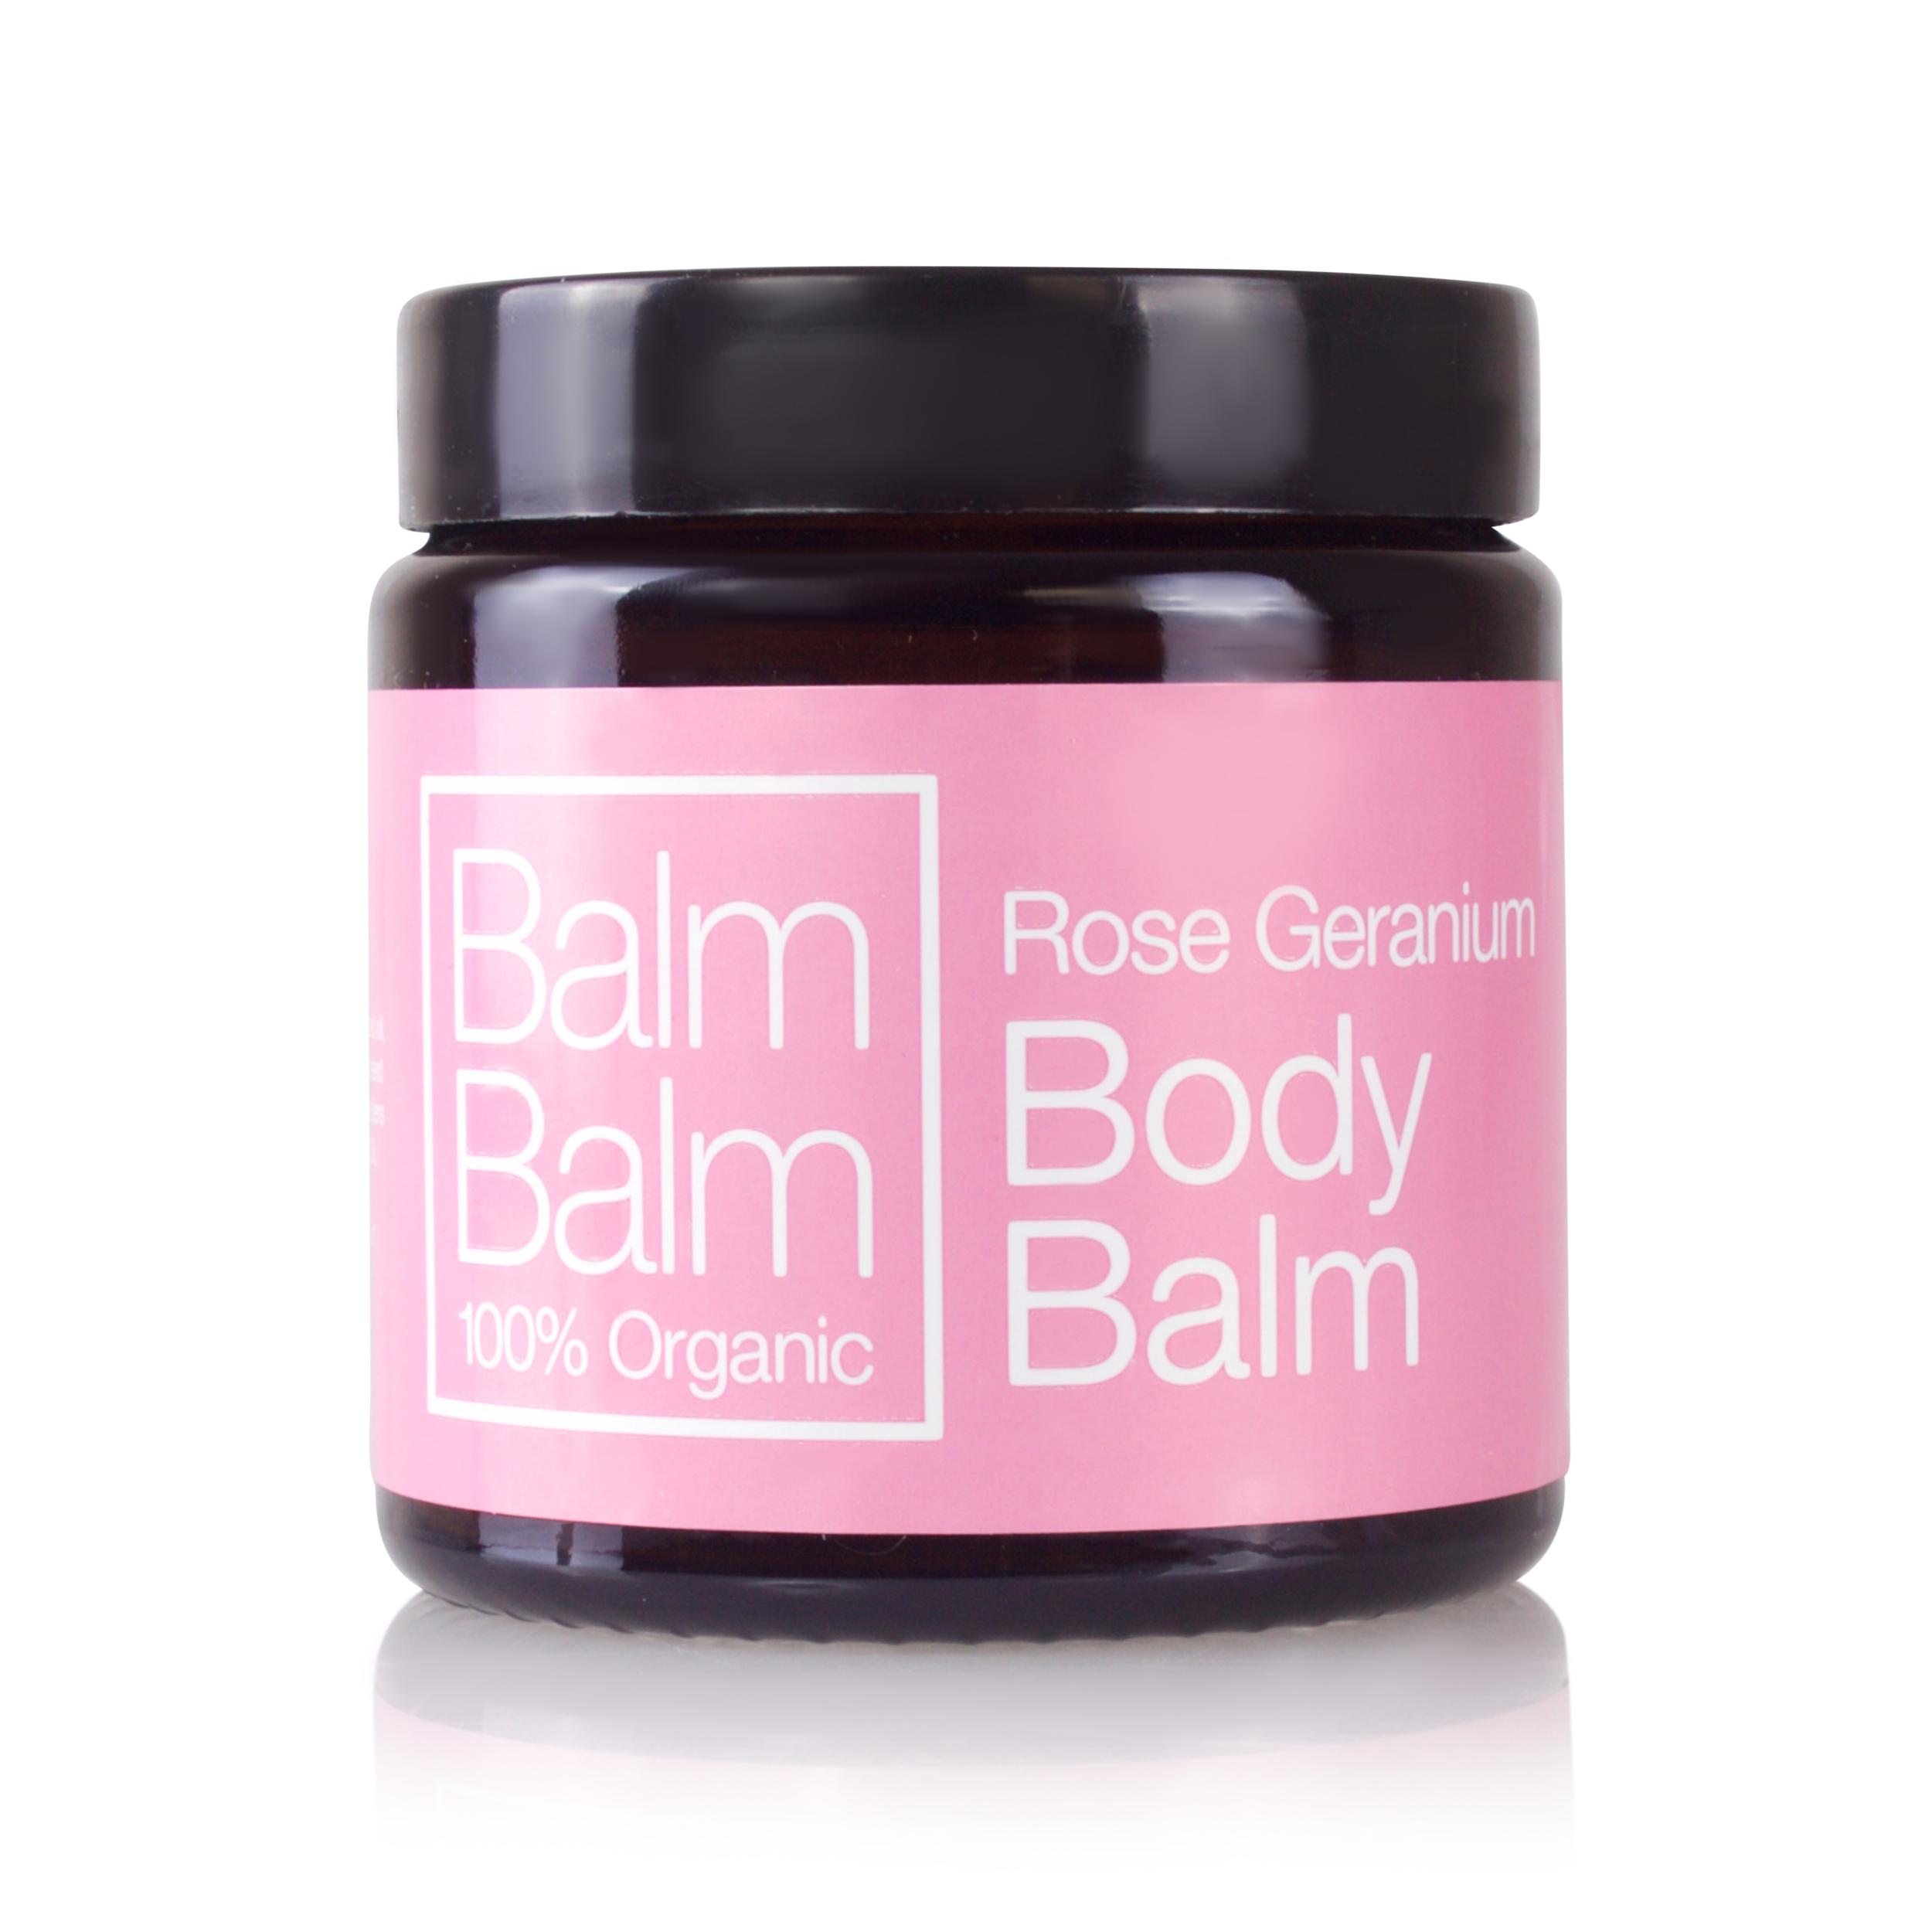 BALM BALM - geranium rosat - body balm - baume corps